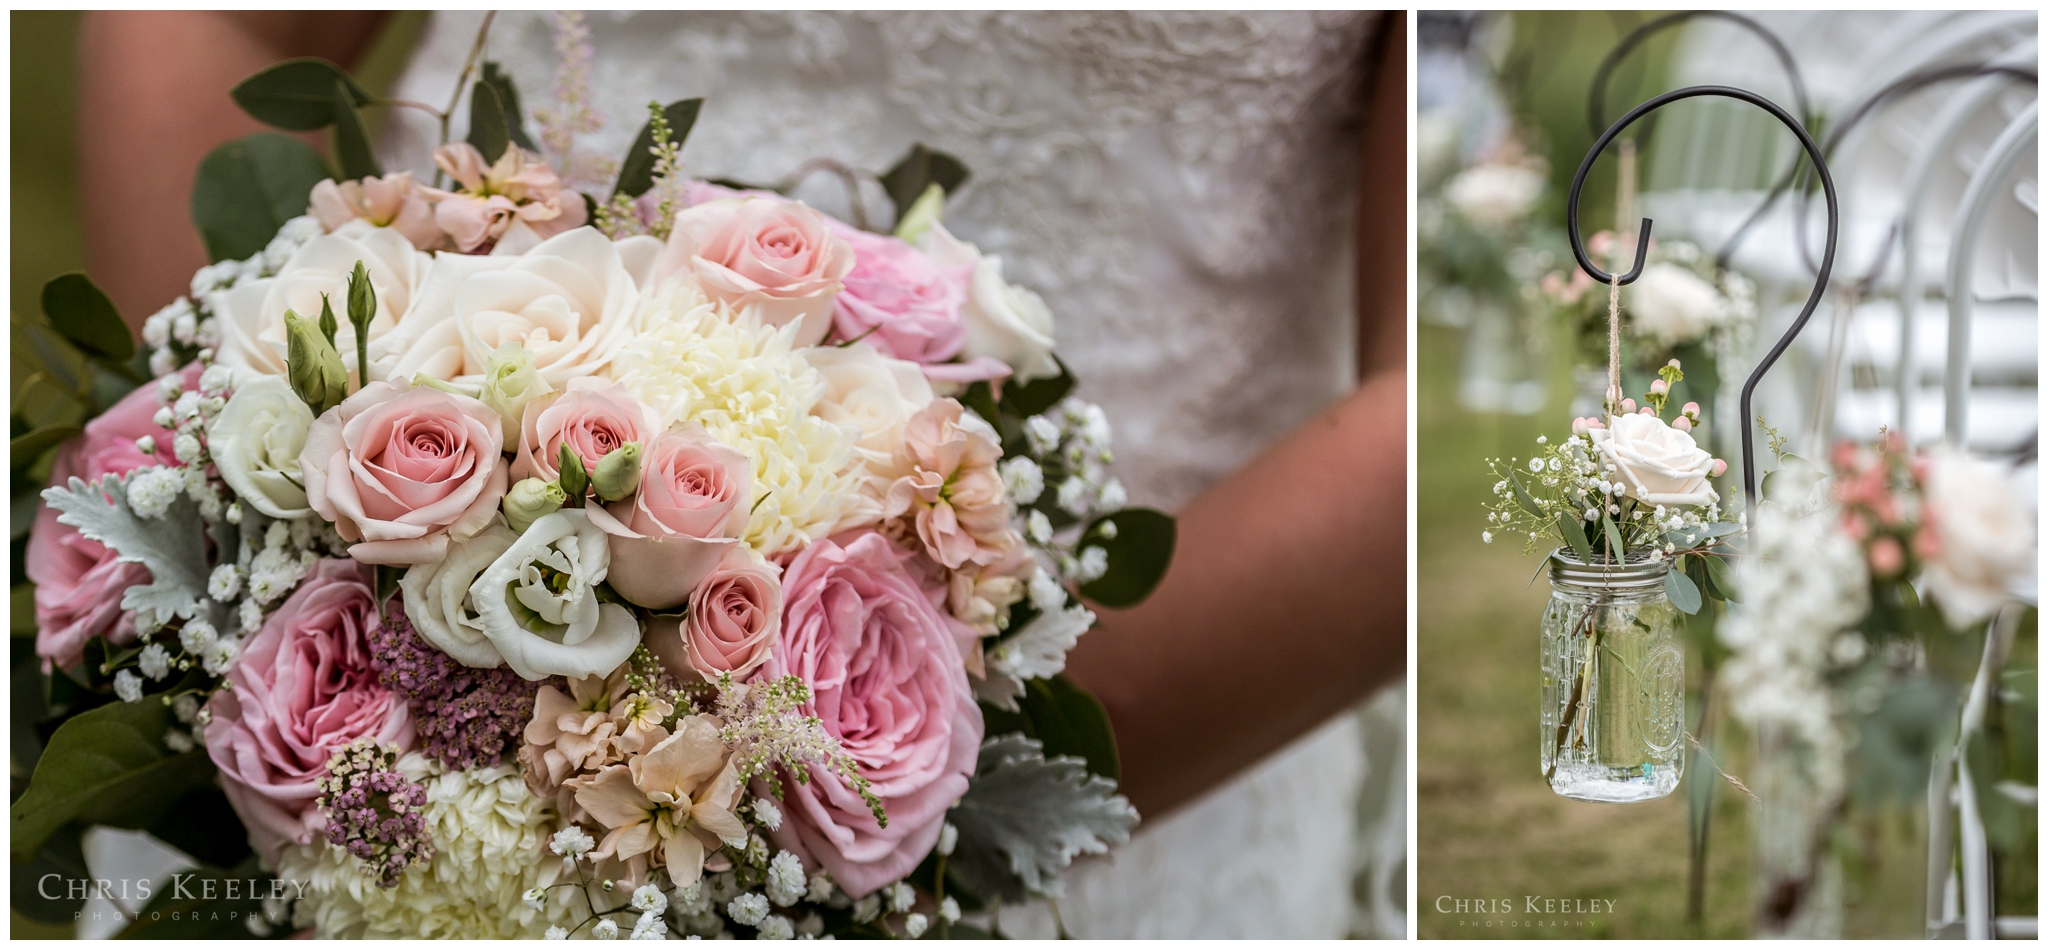 chris-keeley-photography-new-hampshire-wedding-photographer-09.jpg